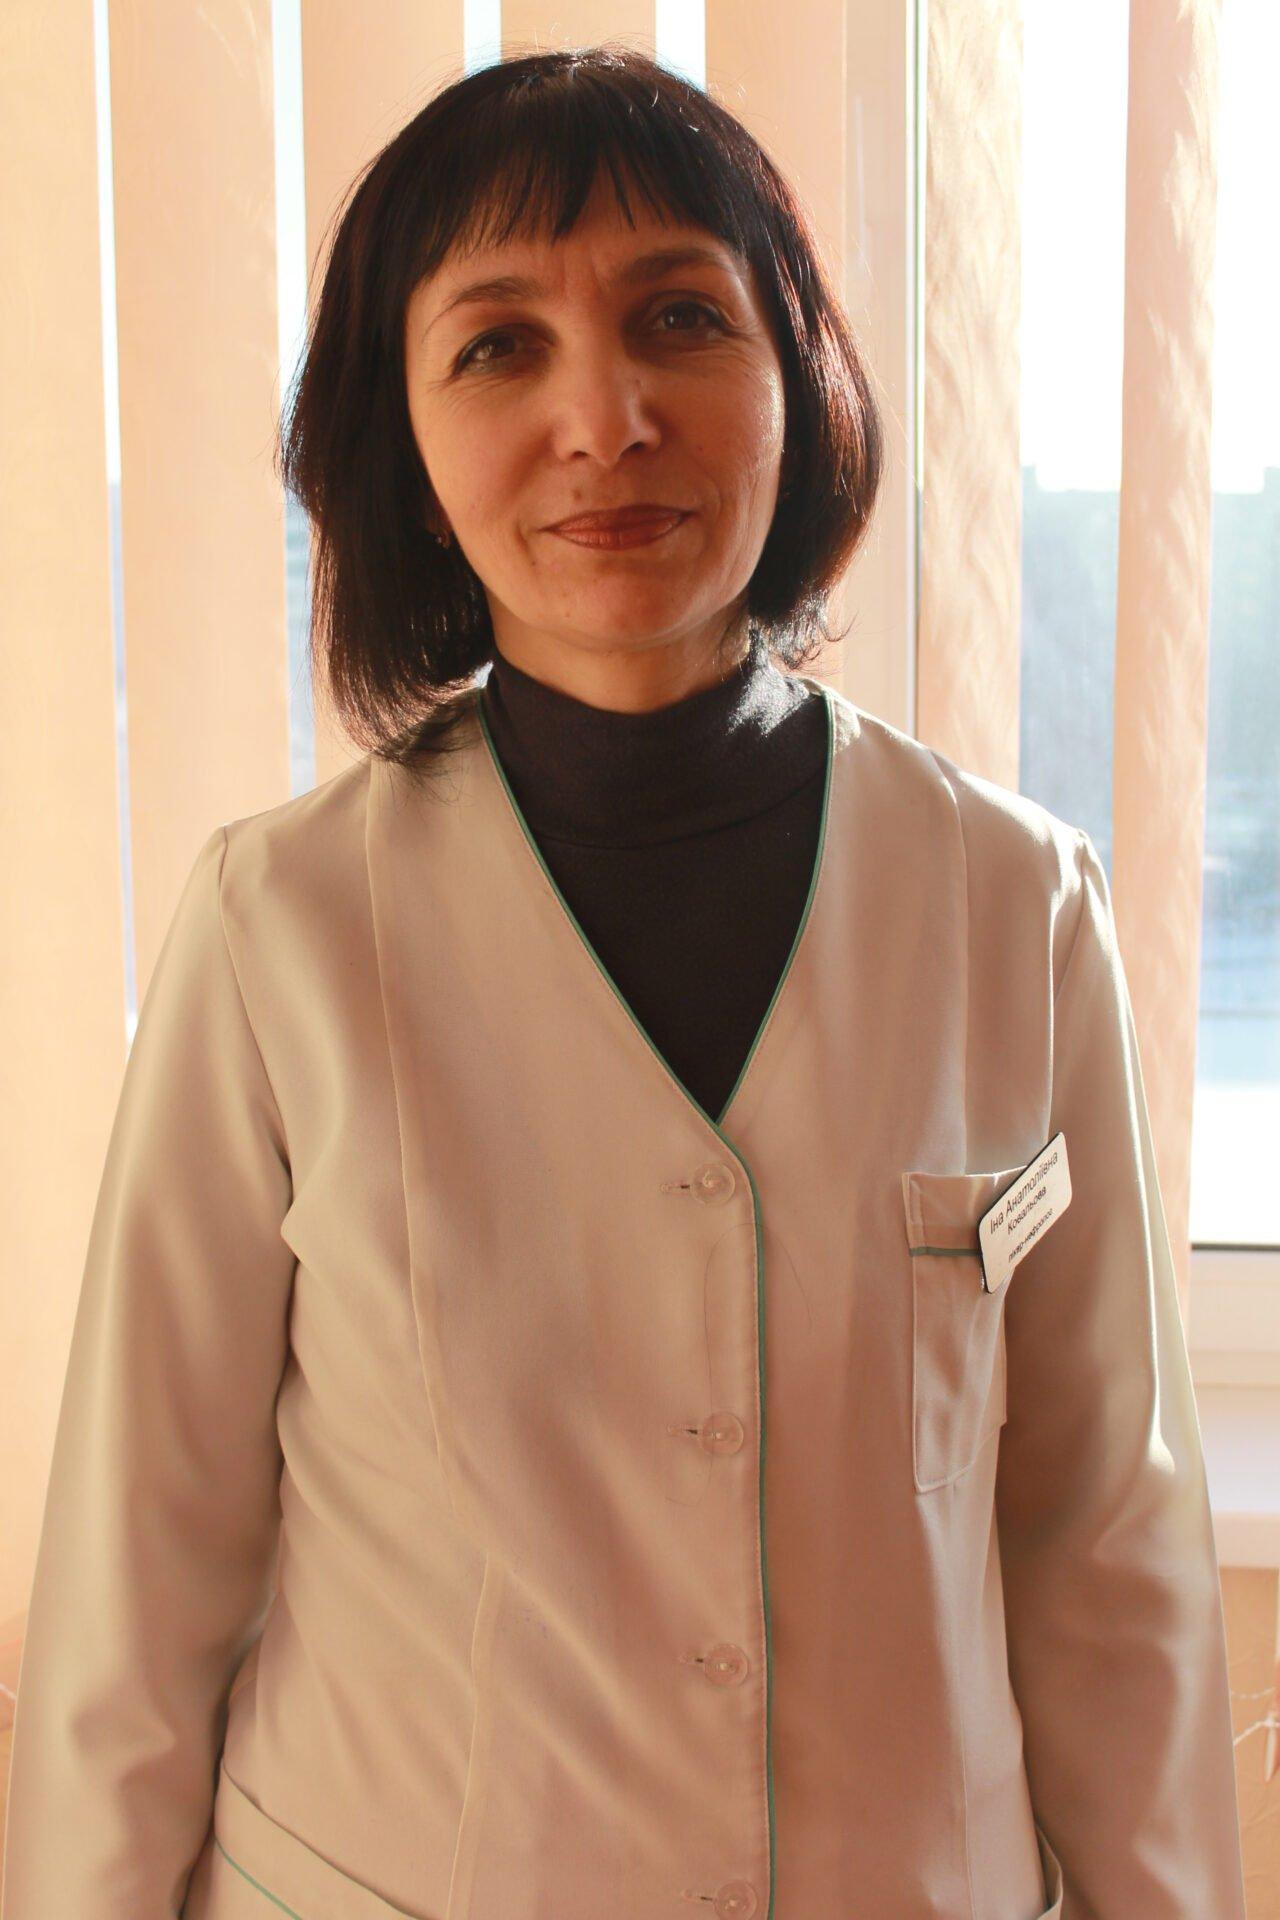 Ковальова Інна Анатоліївна Міська дитяча лікарня №5 детская больница Запорожье